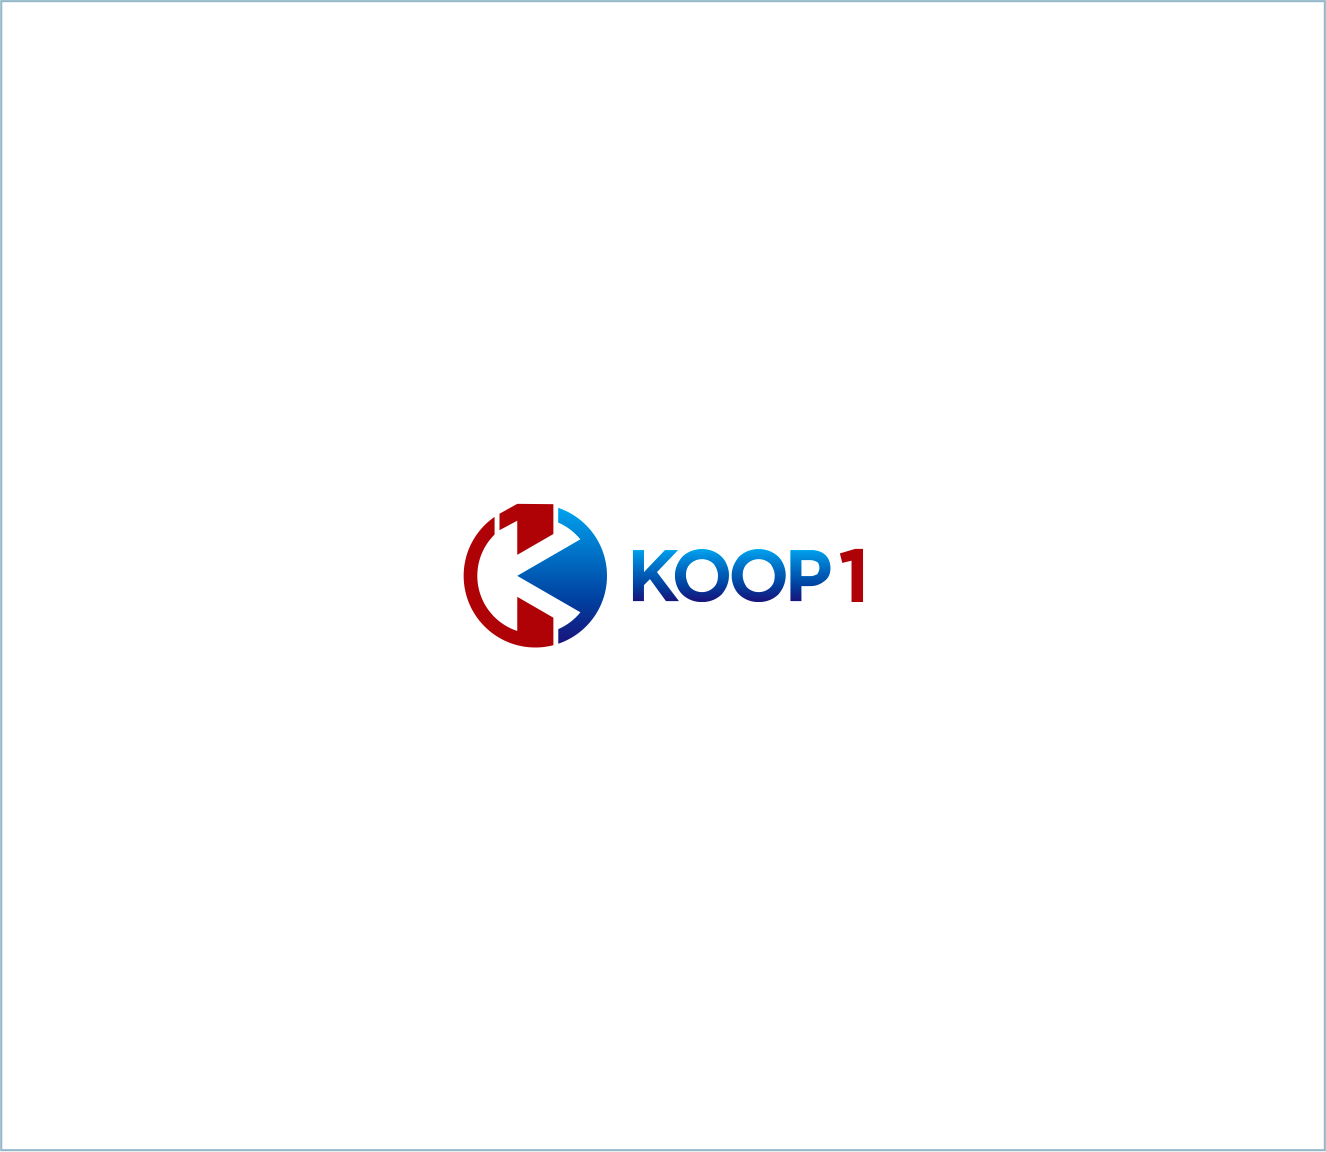 Logo Design by Armada Jamaluddin - Entry No. 36 in the Logo Design Contest Creative Logo Design for KOOP 1.